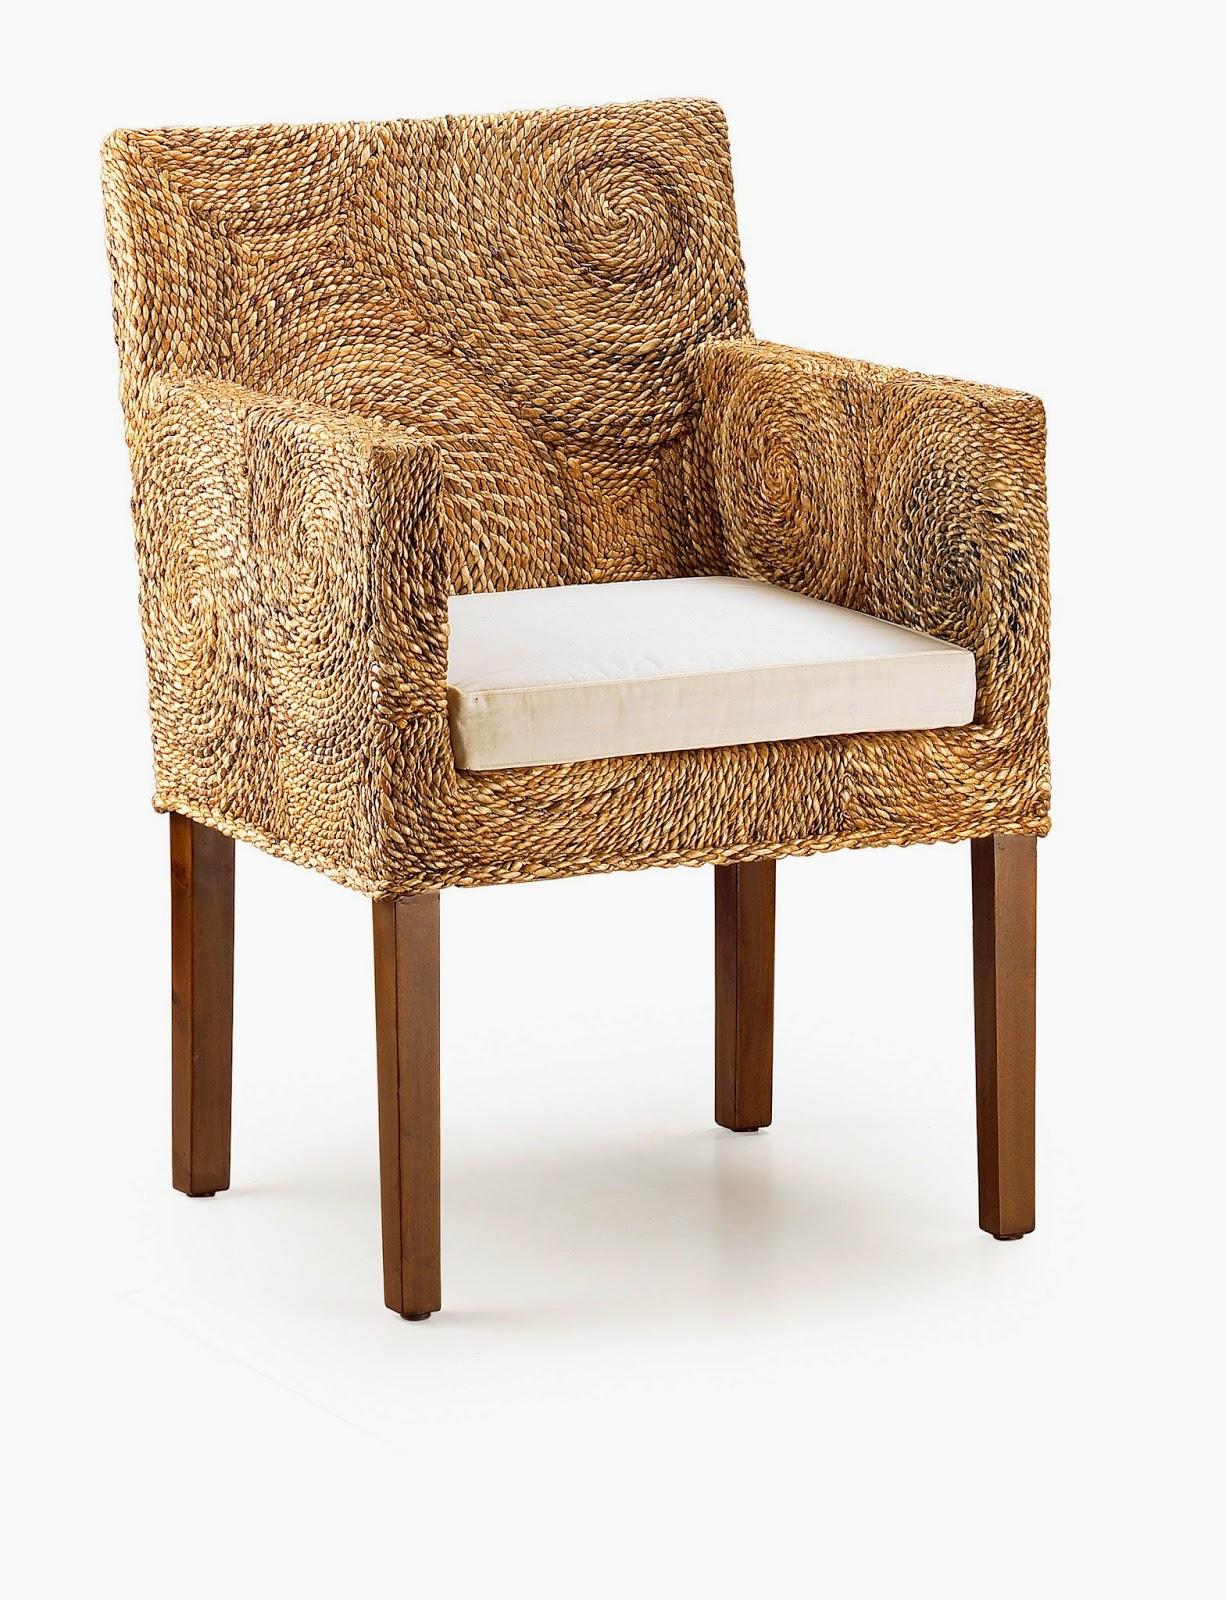 Muebles de comedor 4 sillas de rattan para un comedor for Sillon comedor